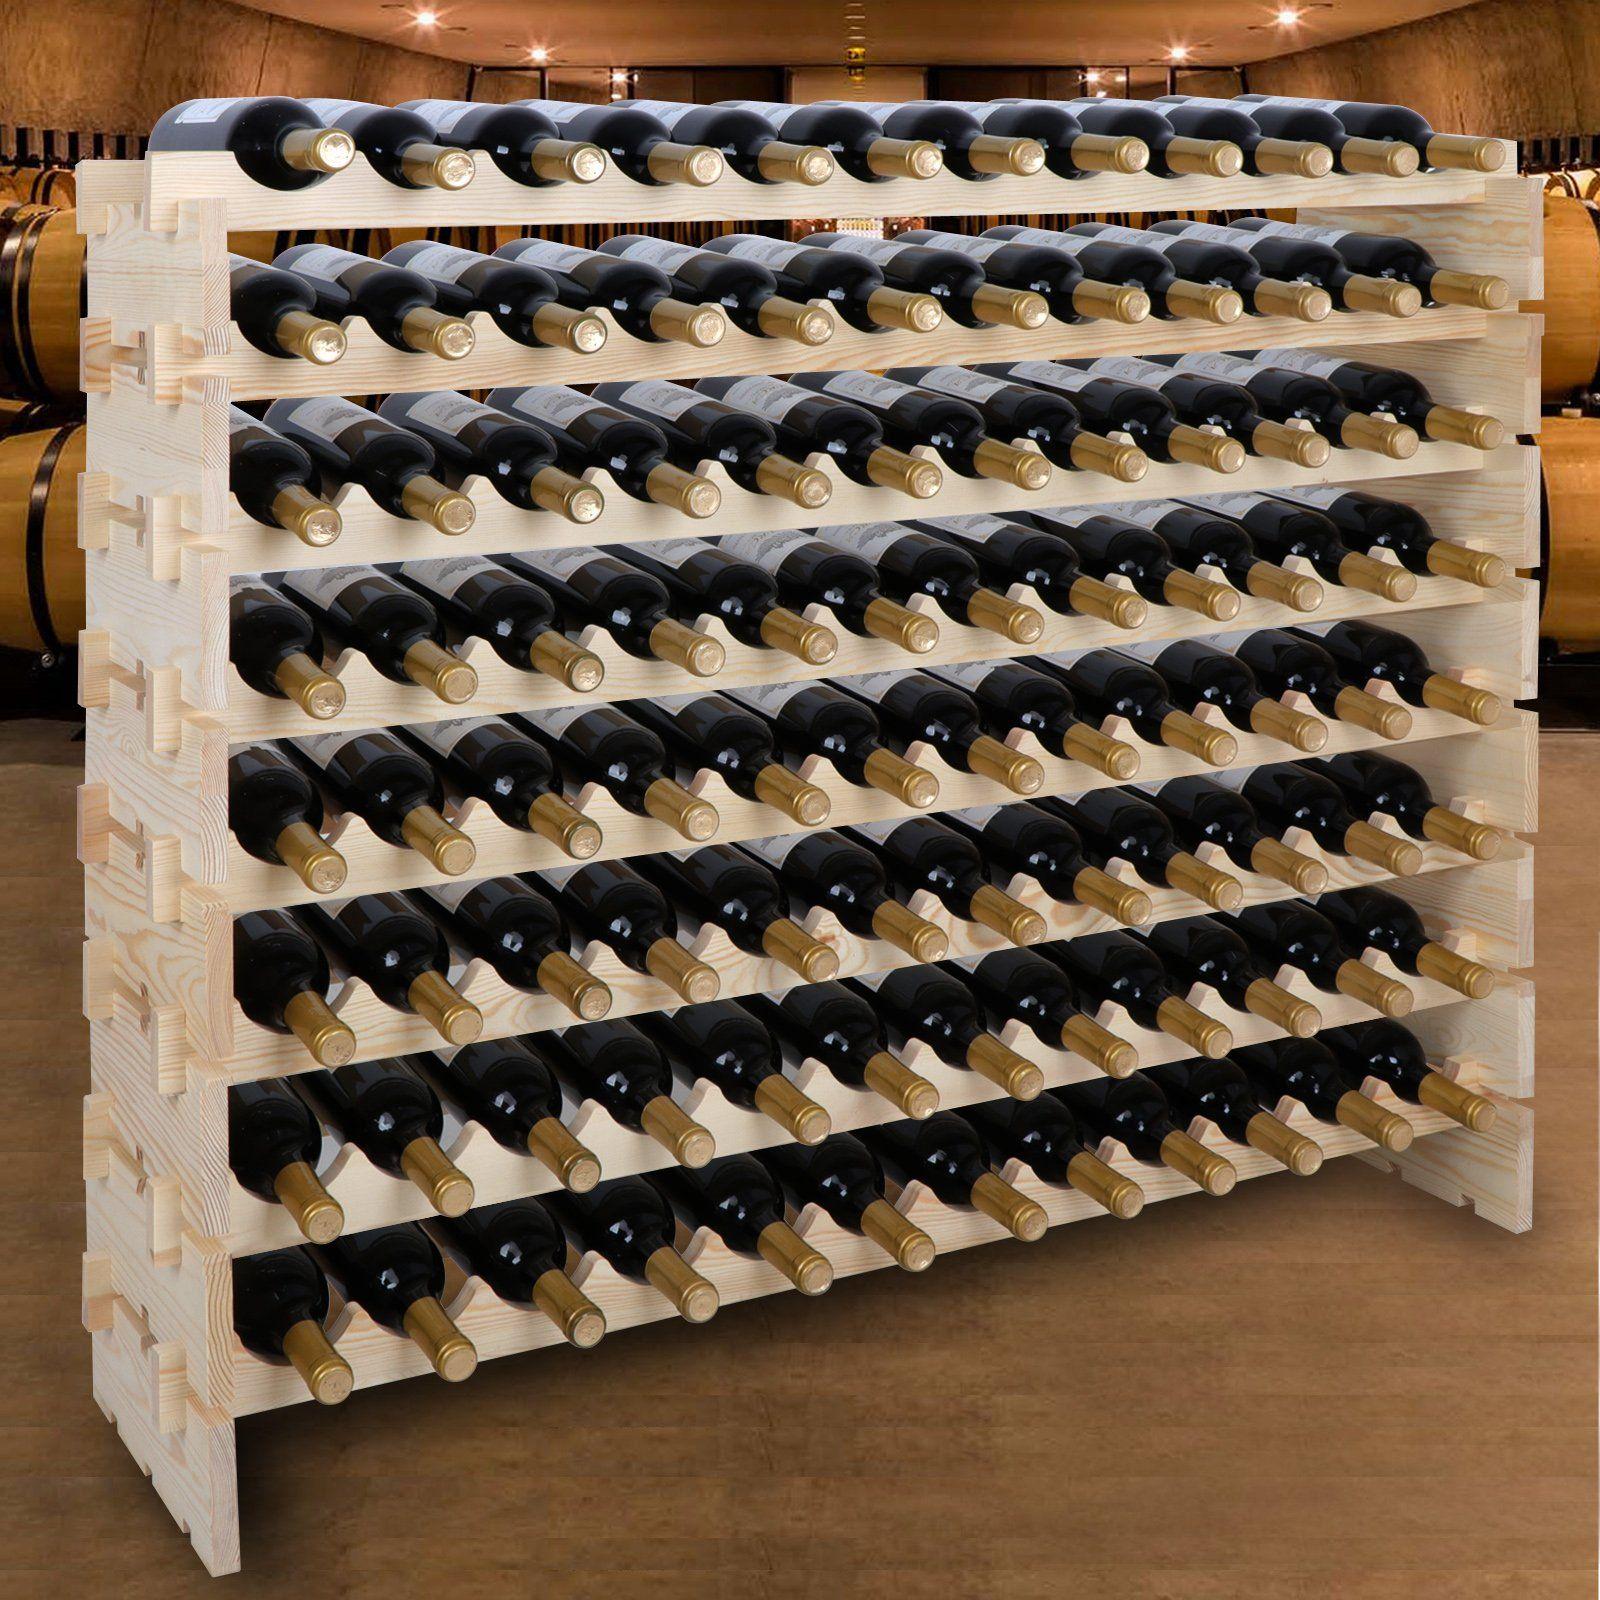 Best Wooden Wine Racks 2019 The Best Wine Racks For Home Wine